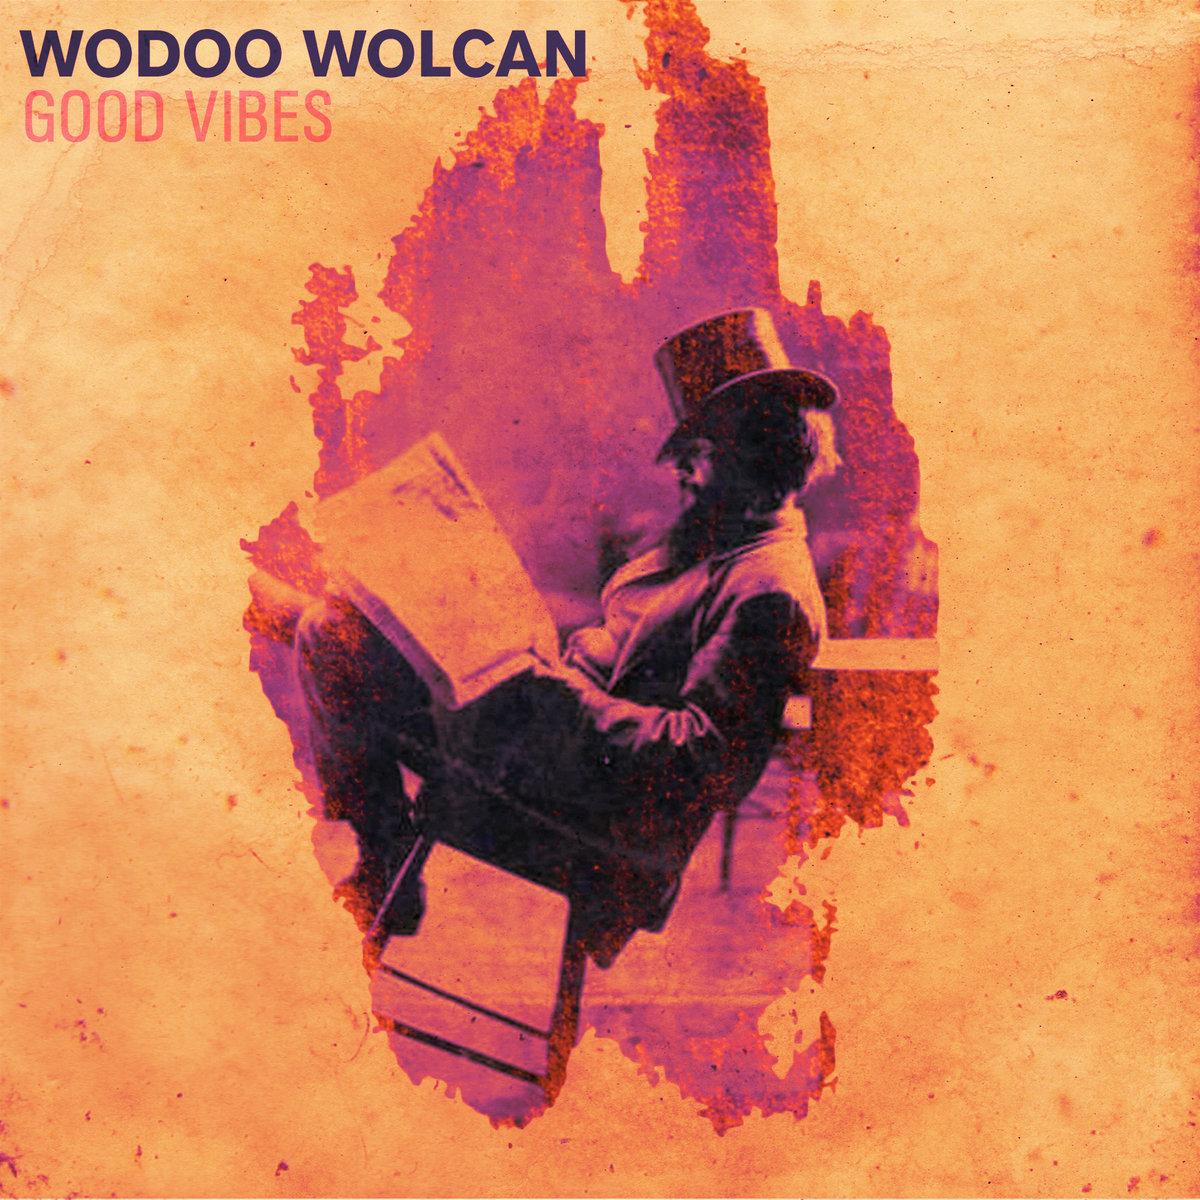 Wodoo Wolcan